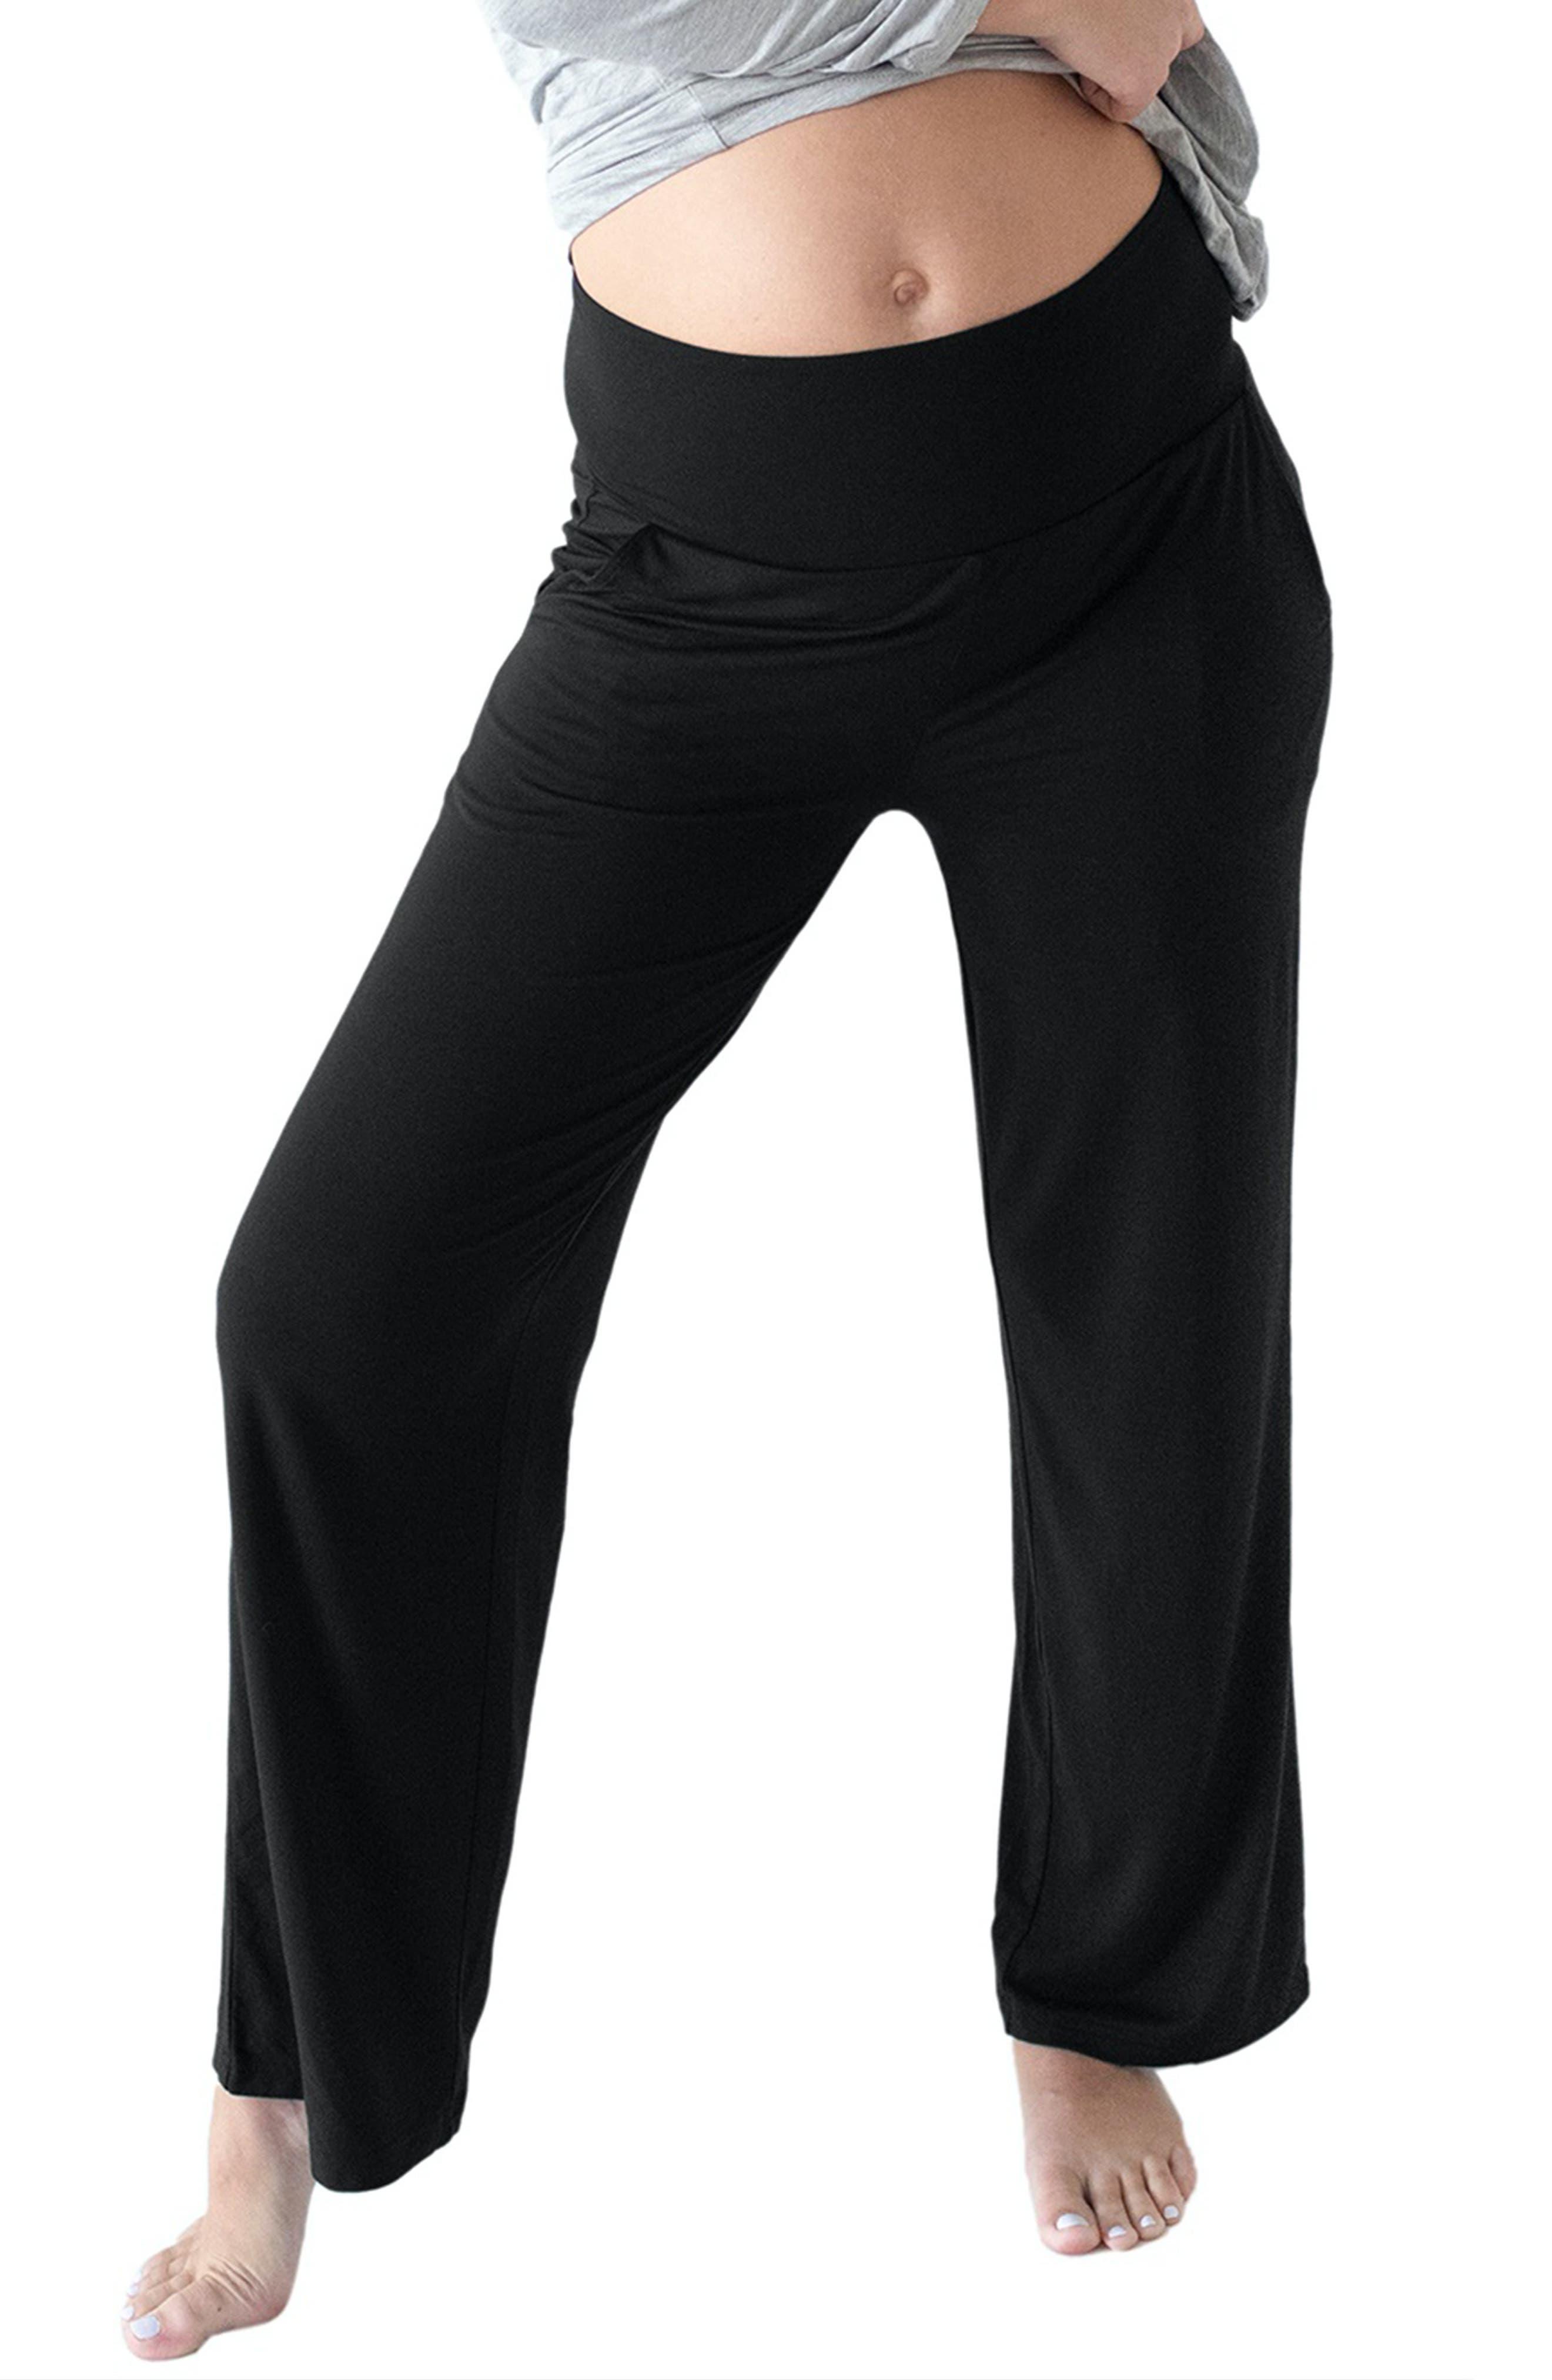 Maternity & Postpartum Lounge Pants